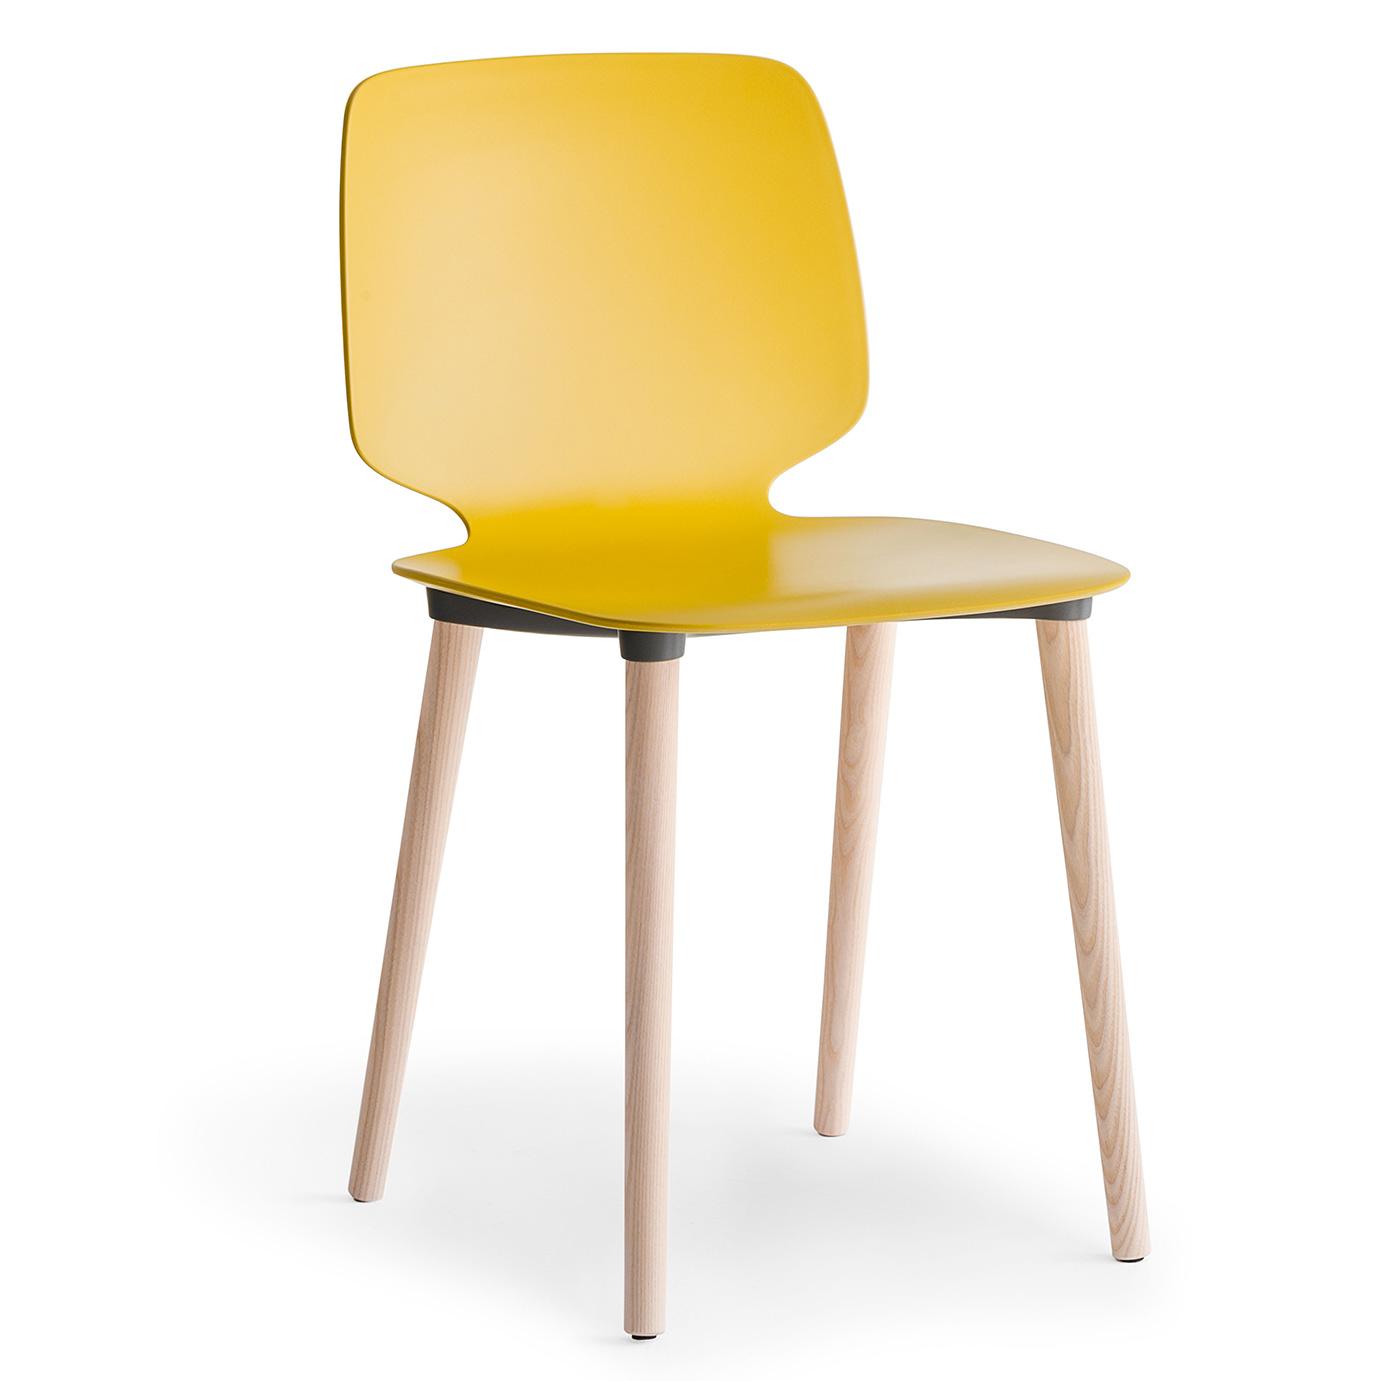 Sedie ufficio bologna sedie ufficio bologna with sedie for Poltrona ufficio juventus